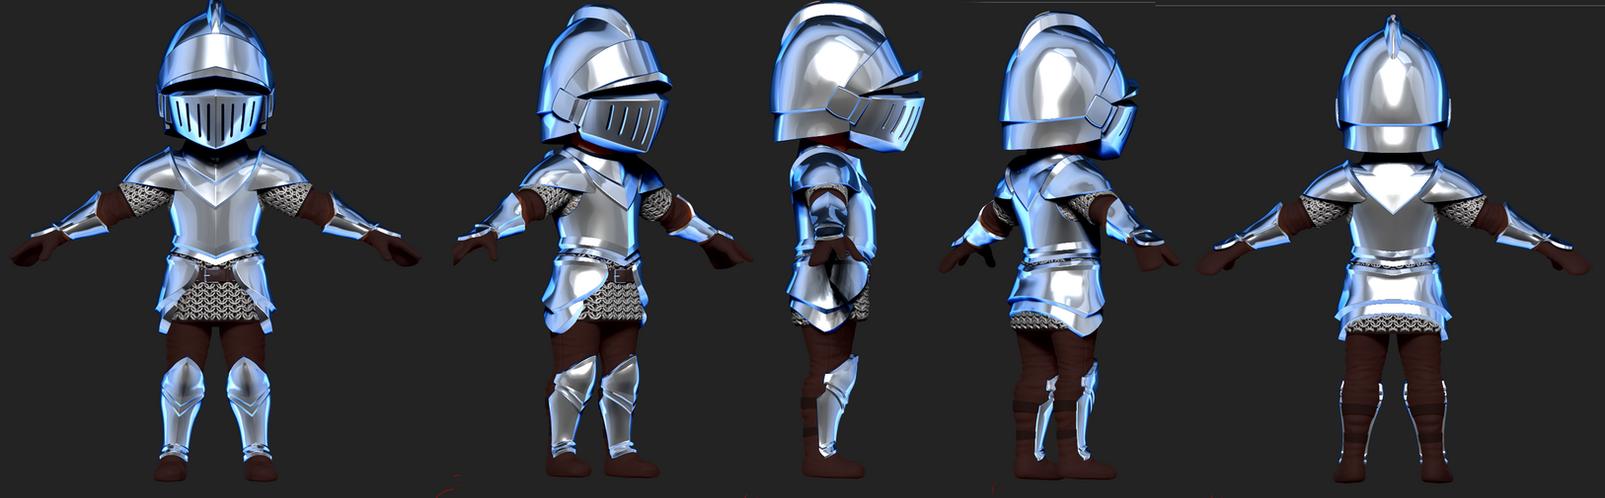 Knight 3D Final by Dmeville